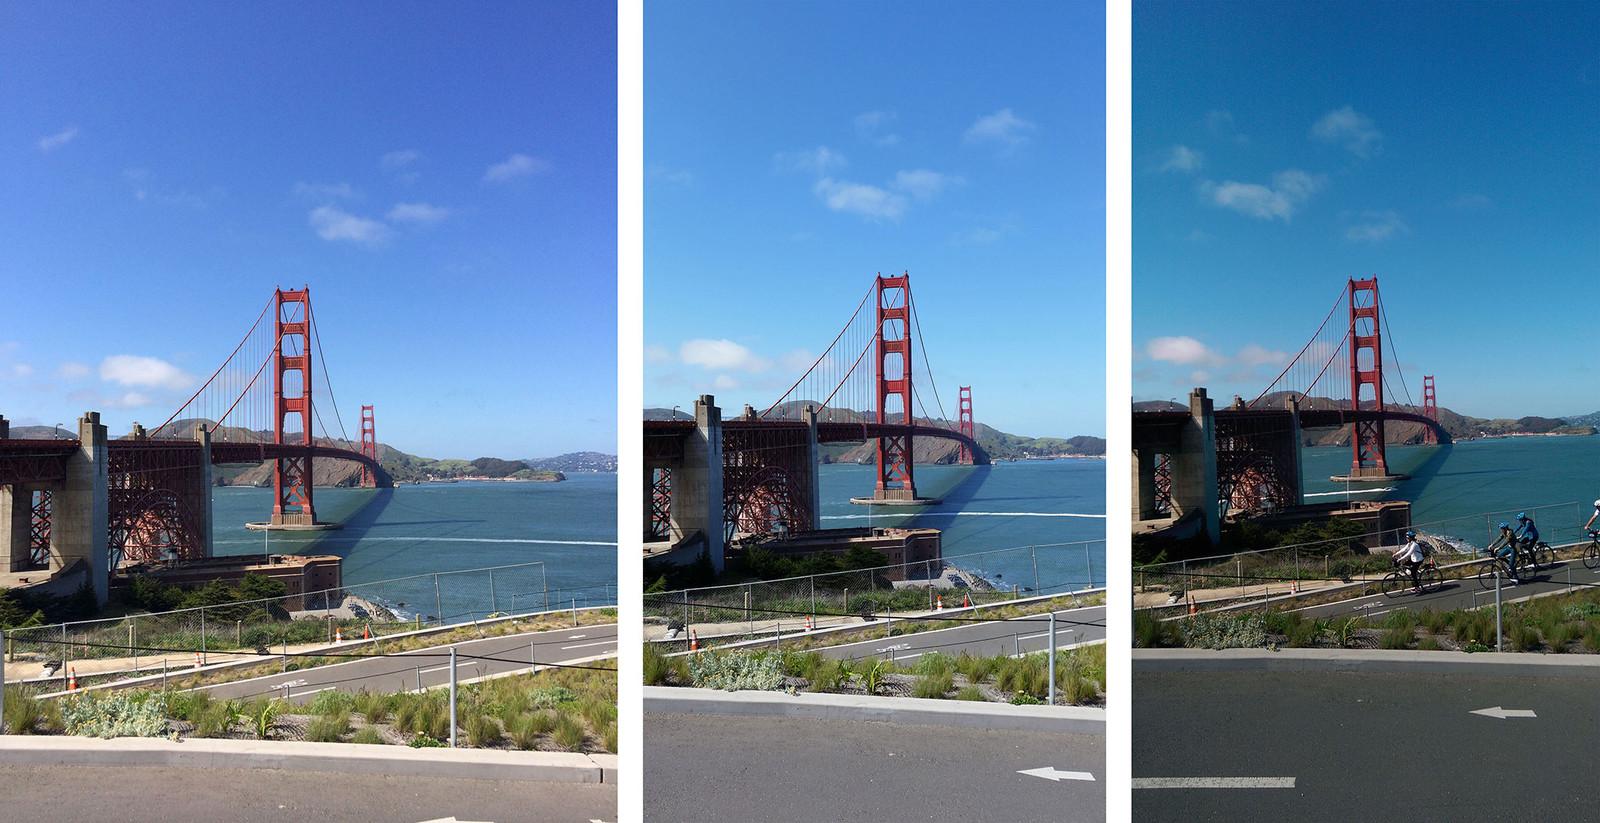 Camera Iphone 5s vs Galaxy s5 Iphone 5s e Galaxy s5